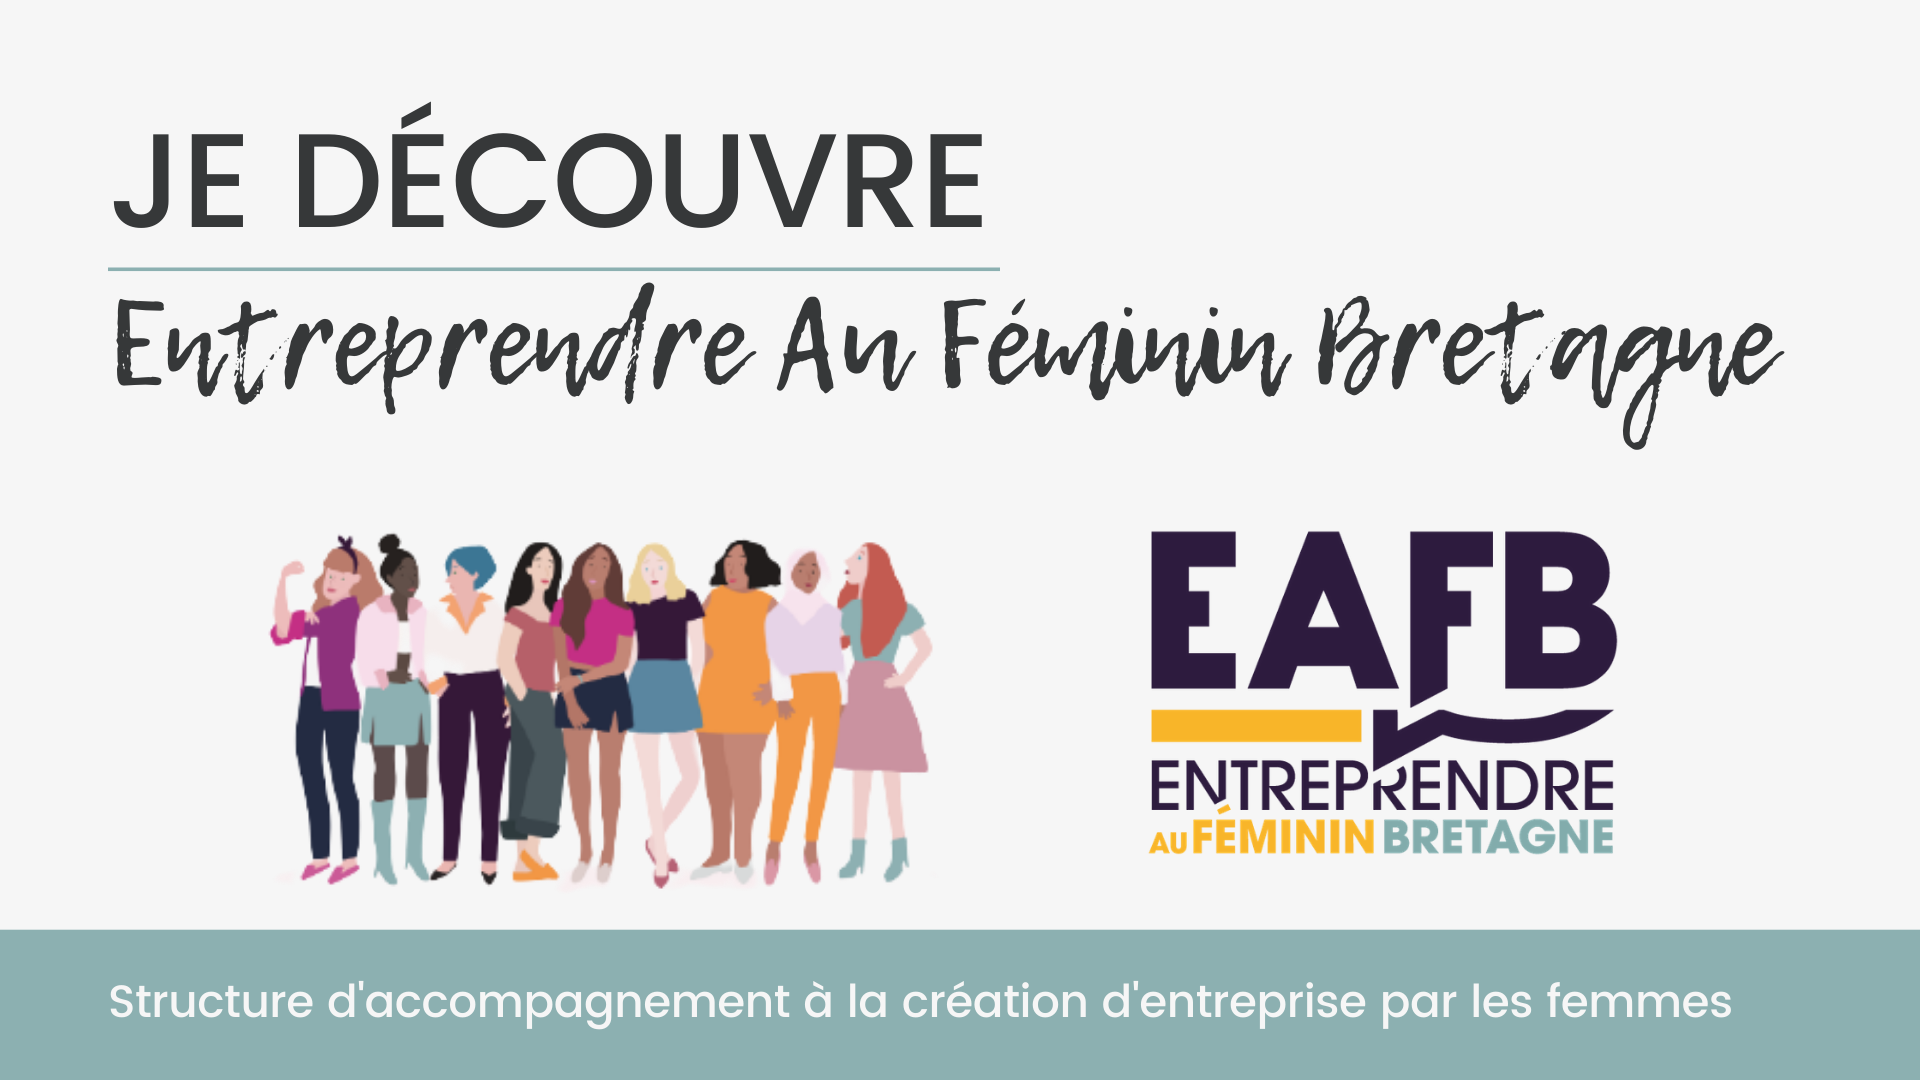 Découverte Information Entreprenariat Feminin